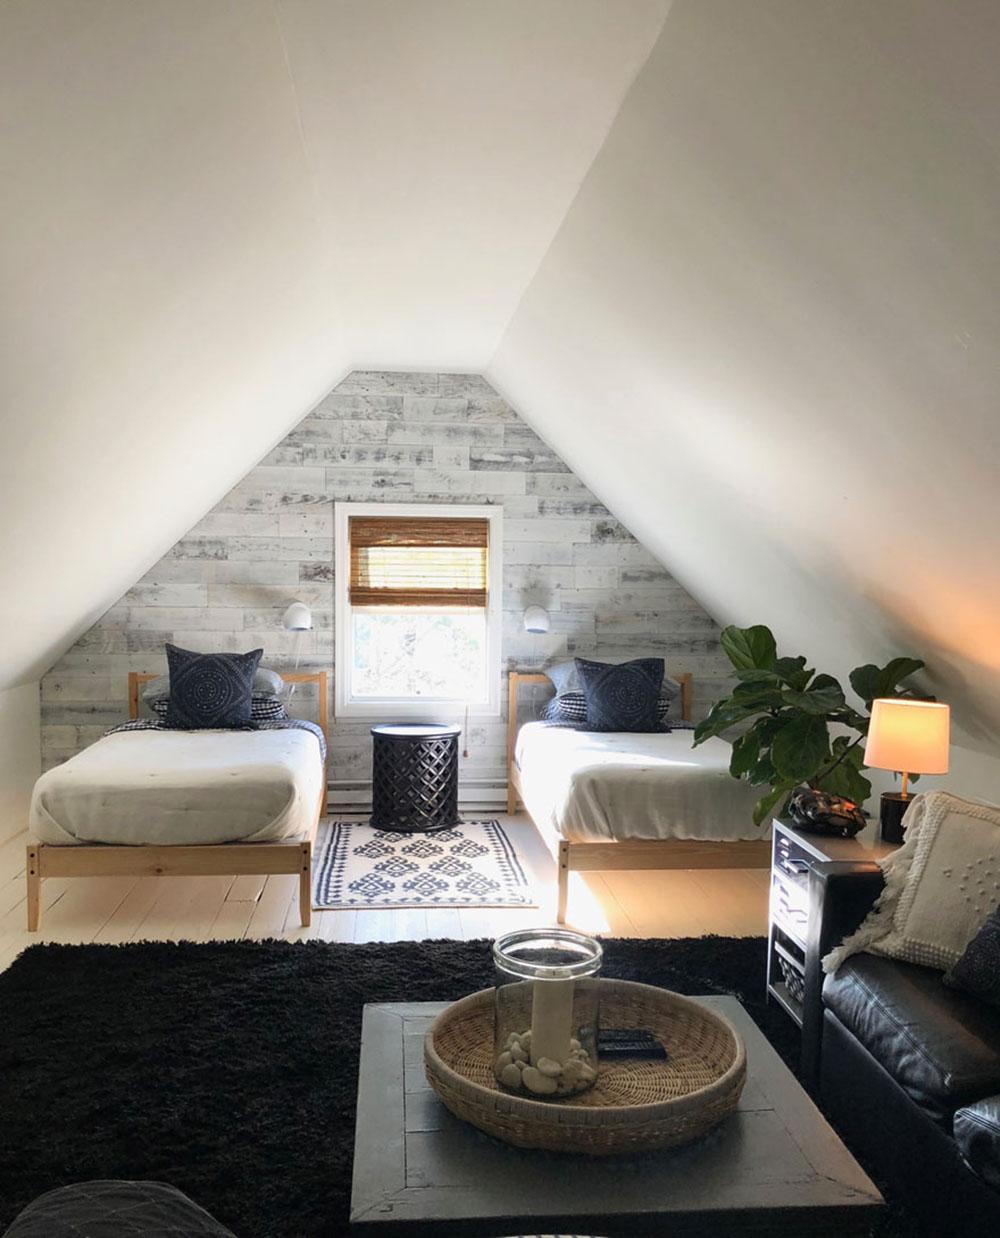 attic-space-shiplap-stikwood-cozy-guest-room.jpg